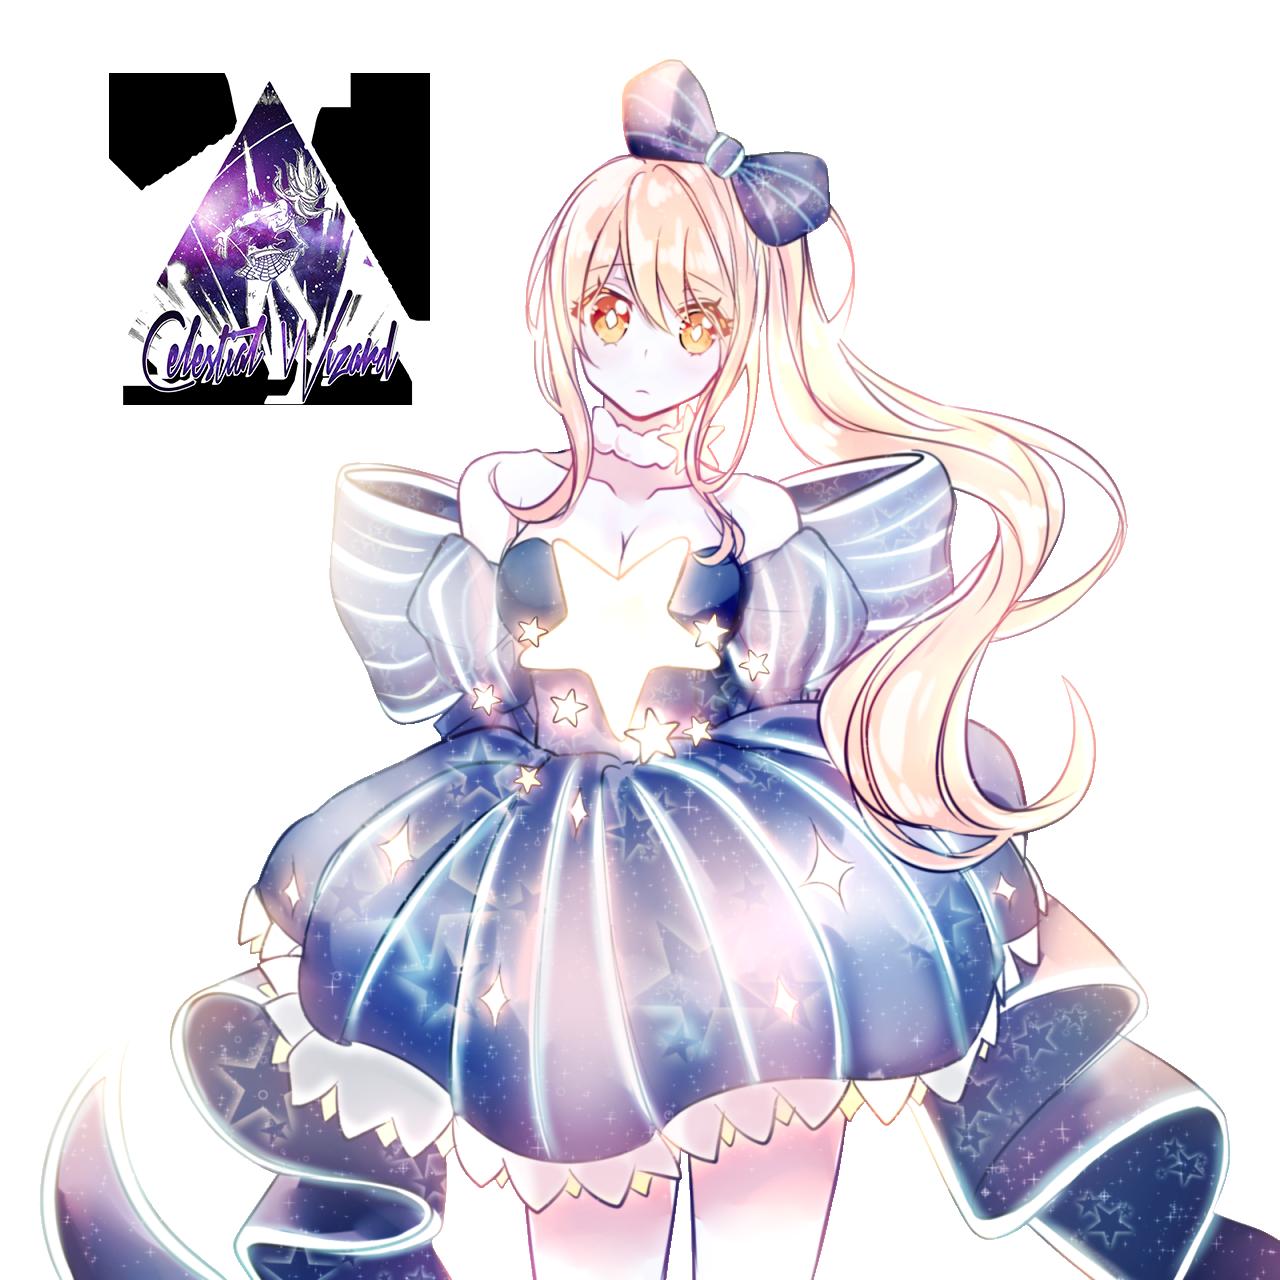 Lucy Heartfilia Fairy Tail Render #12 by celestialwizzard